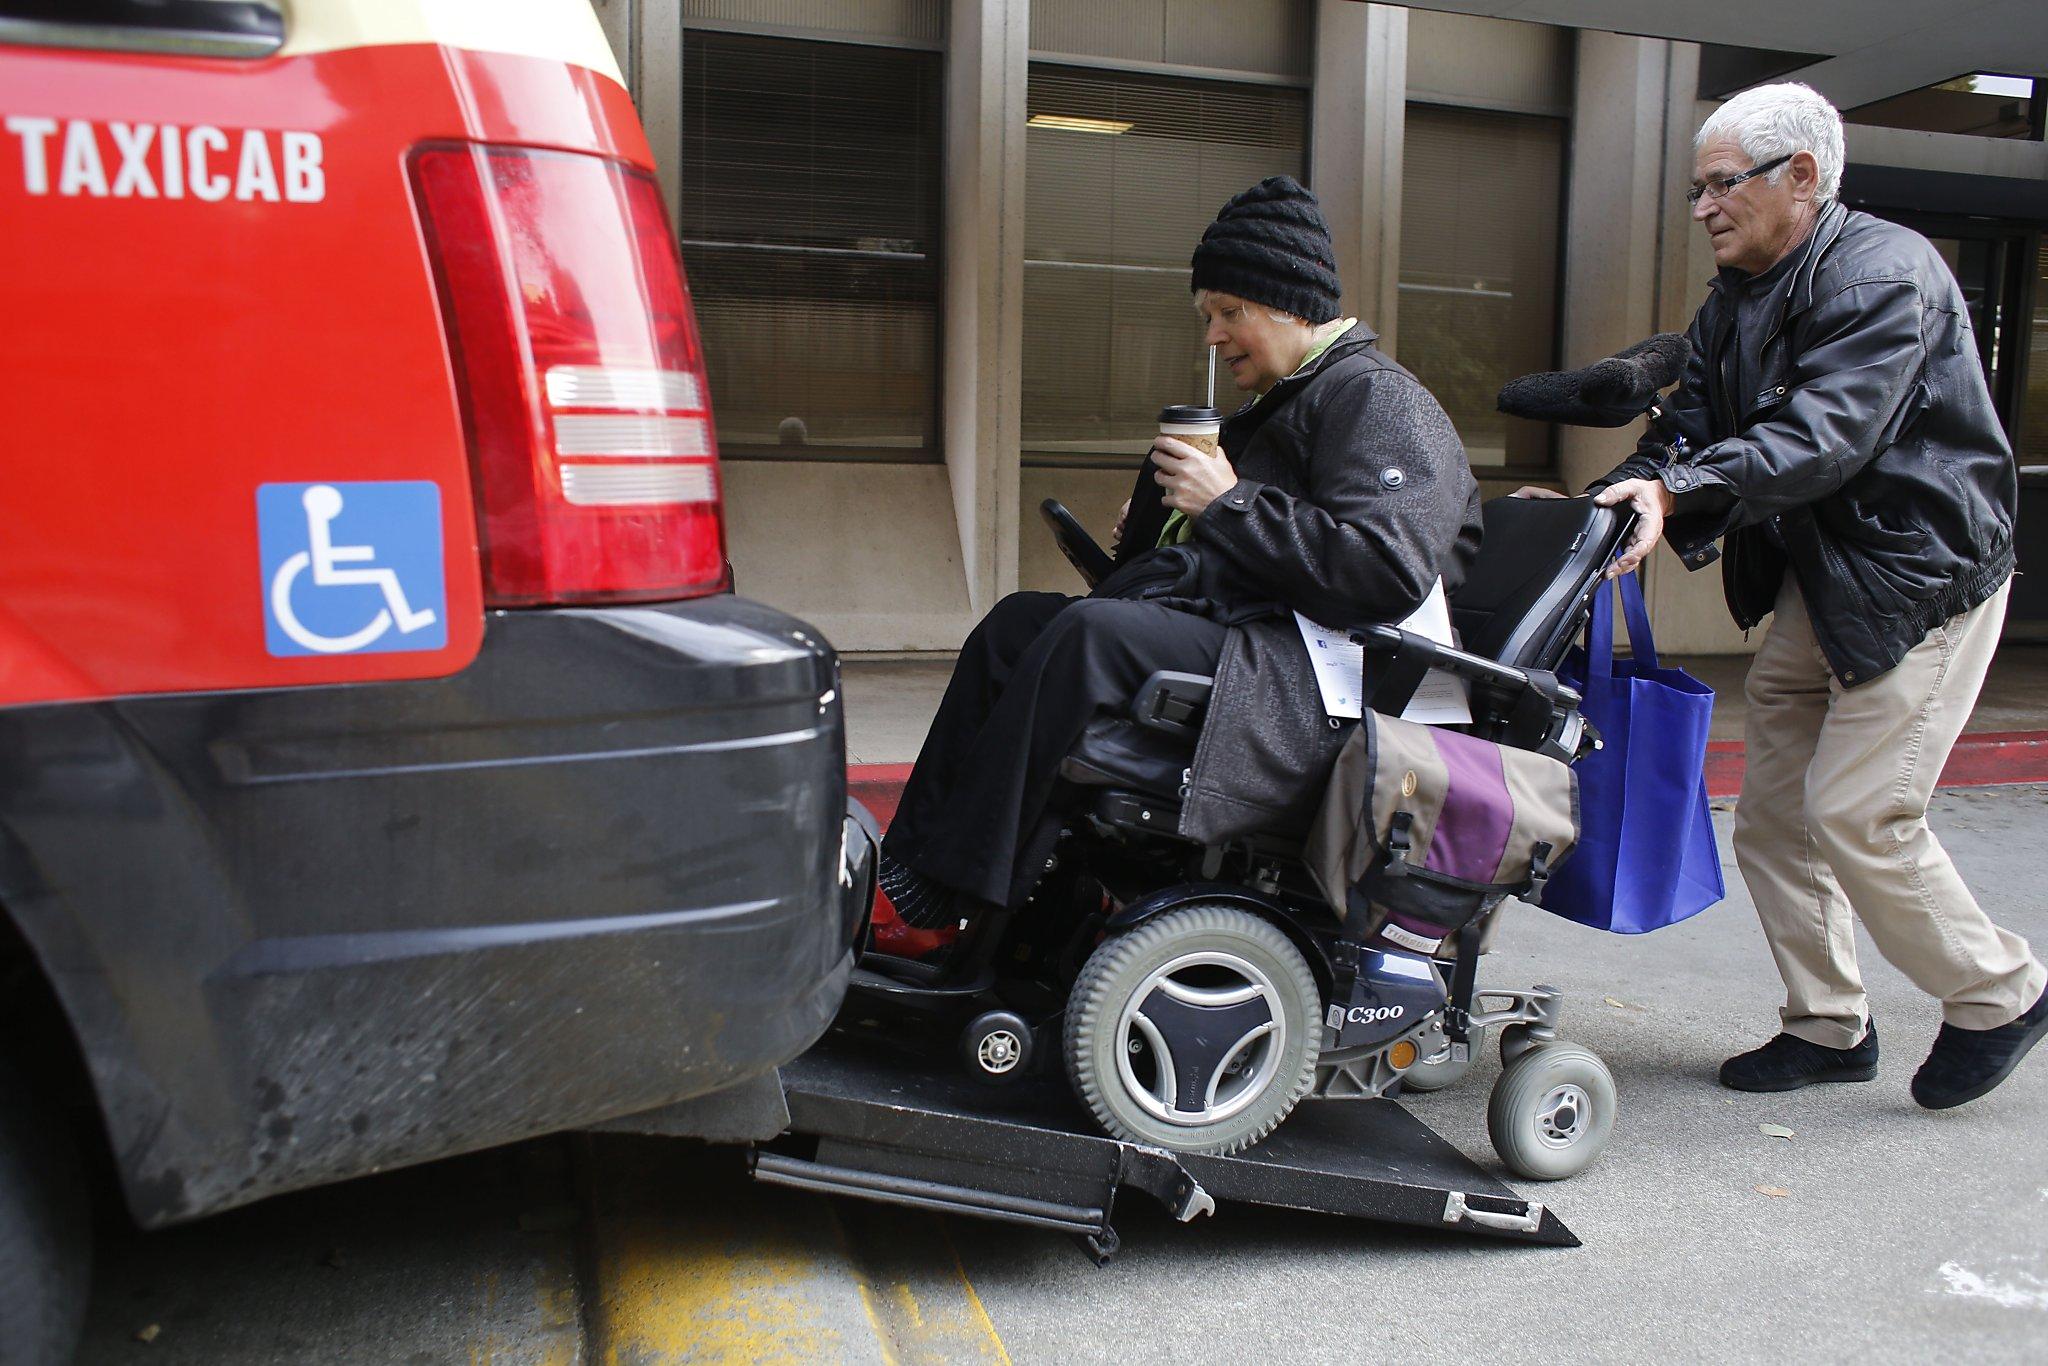 as uber lyft sidecar grow so do concerns of disabled sfgate. Black Bedroom Furniture Sets. Home Design Ideas